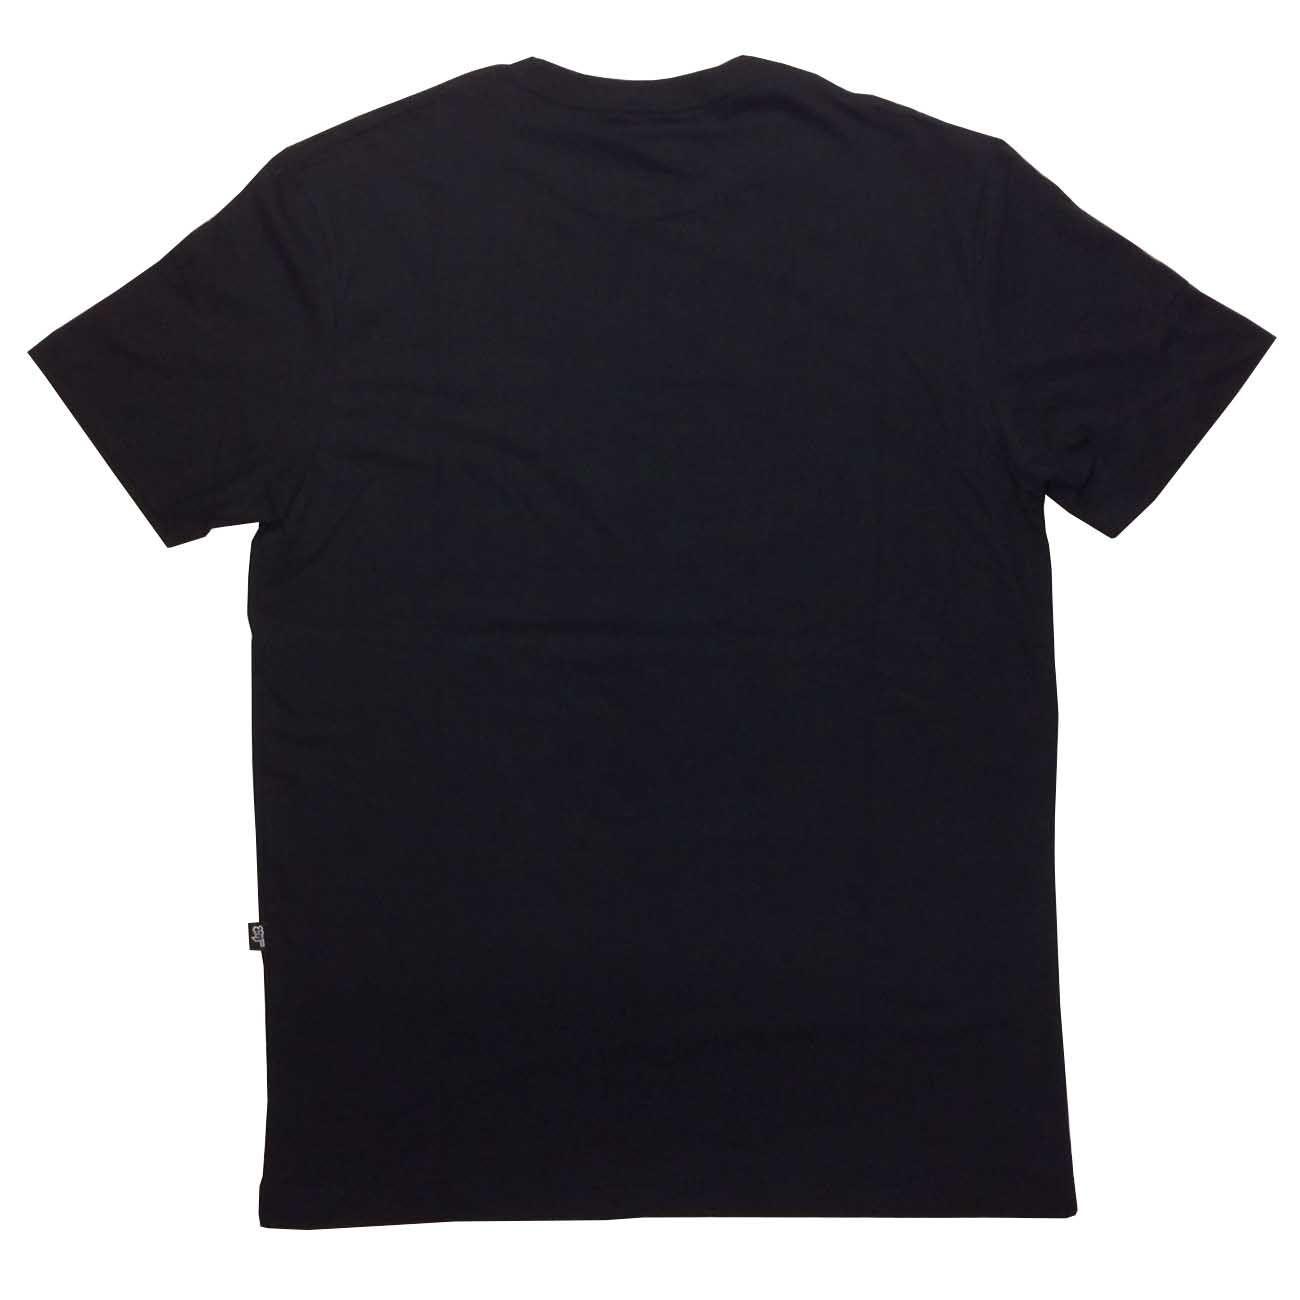 Camiseta Lost Z Boy 22022801 Masculina